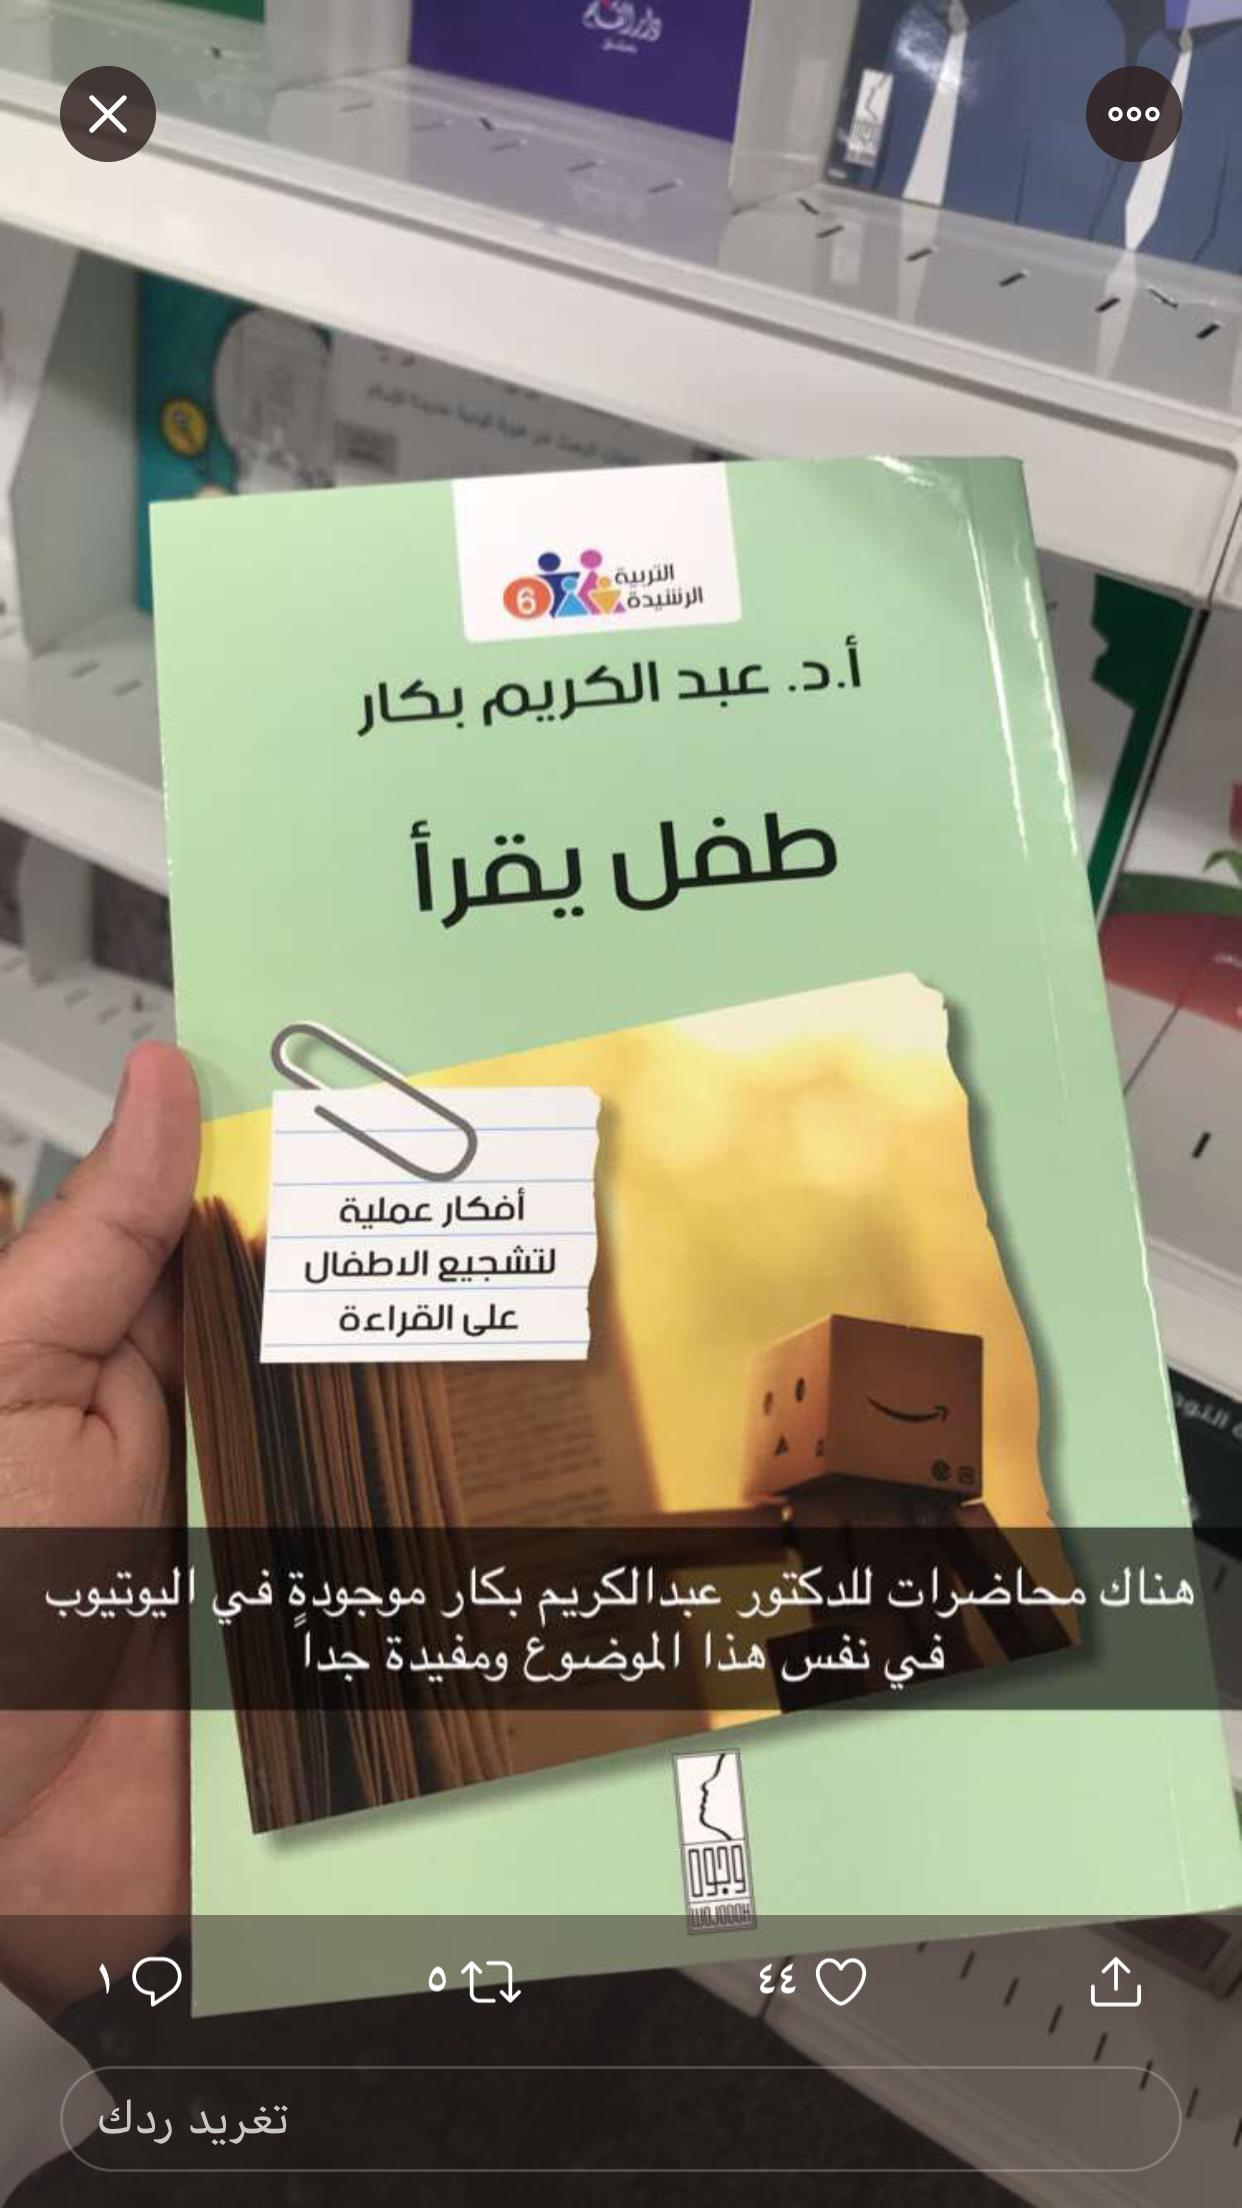 Pin By المدربة أماني فلمبان On كتبbooks Inspirational Books Ebooks Free Books Pdf Books Reading